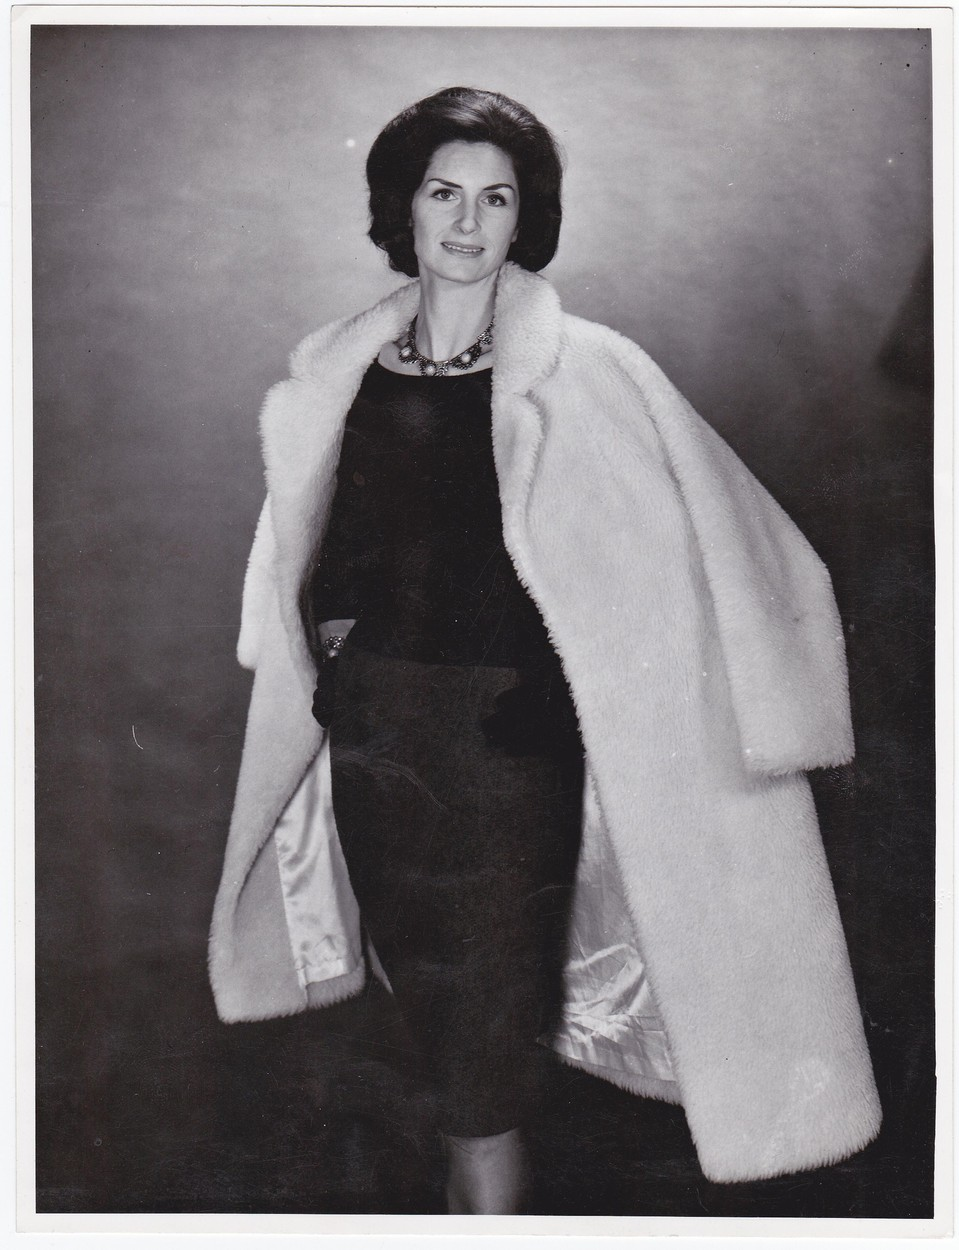 Daphne Selfe modell